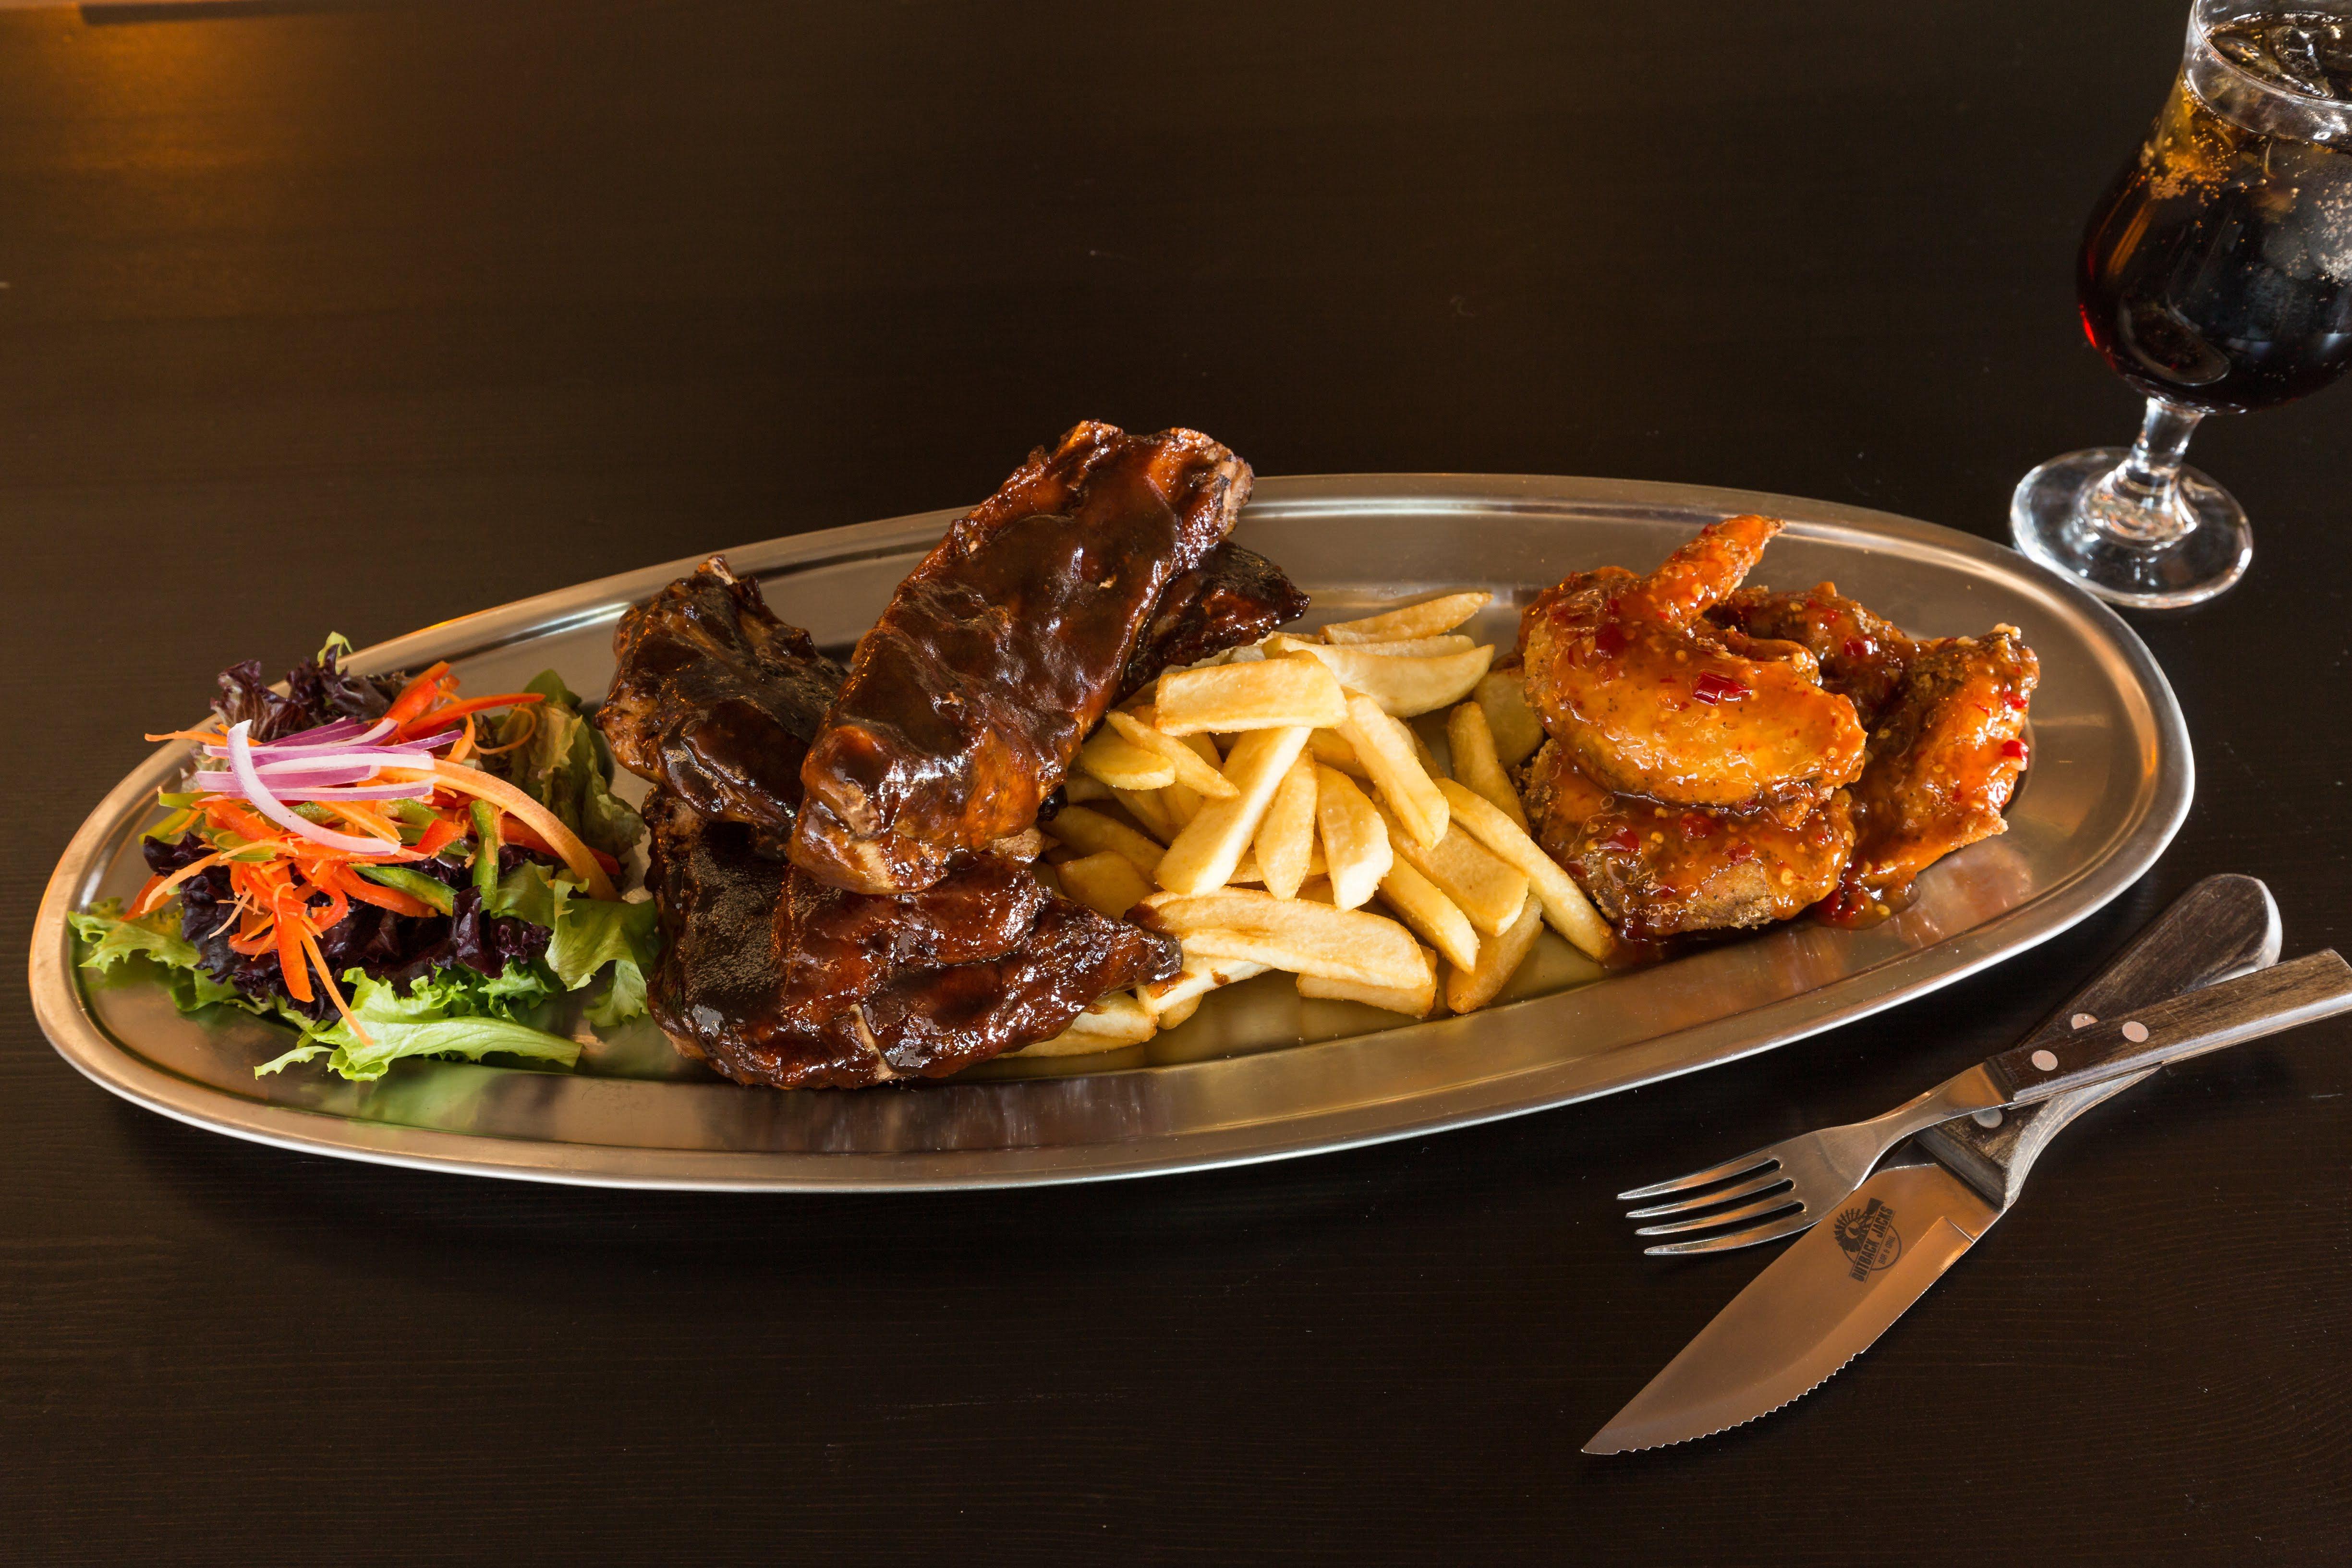 iconic-franchise-restaurant-full-training-provided-glendale-5